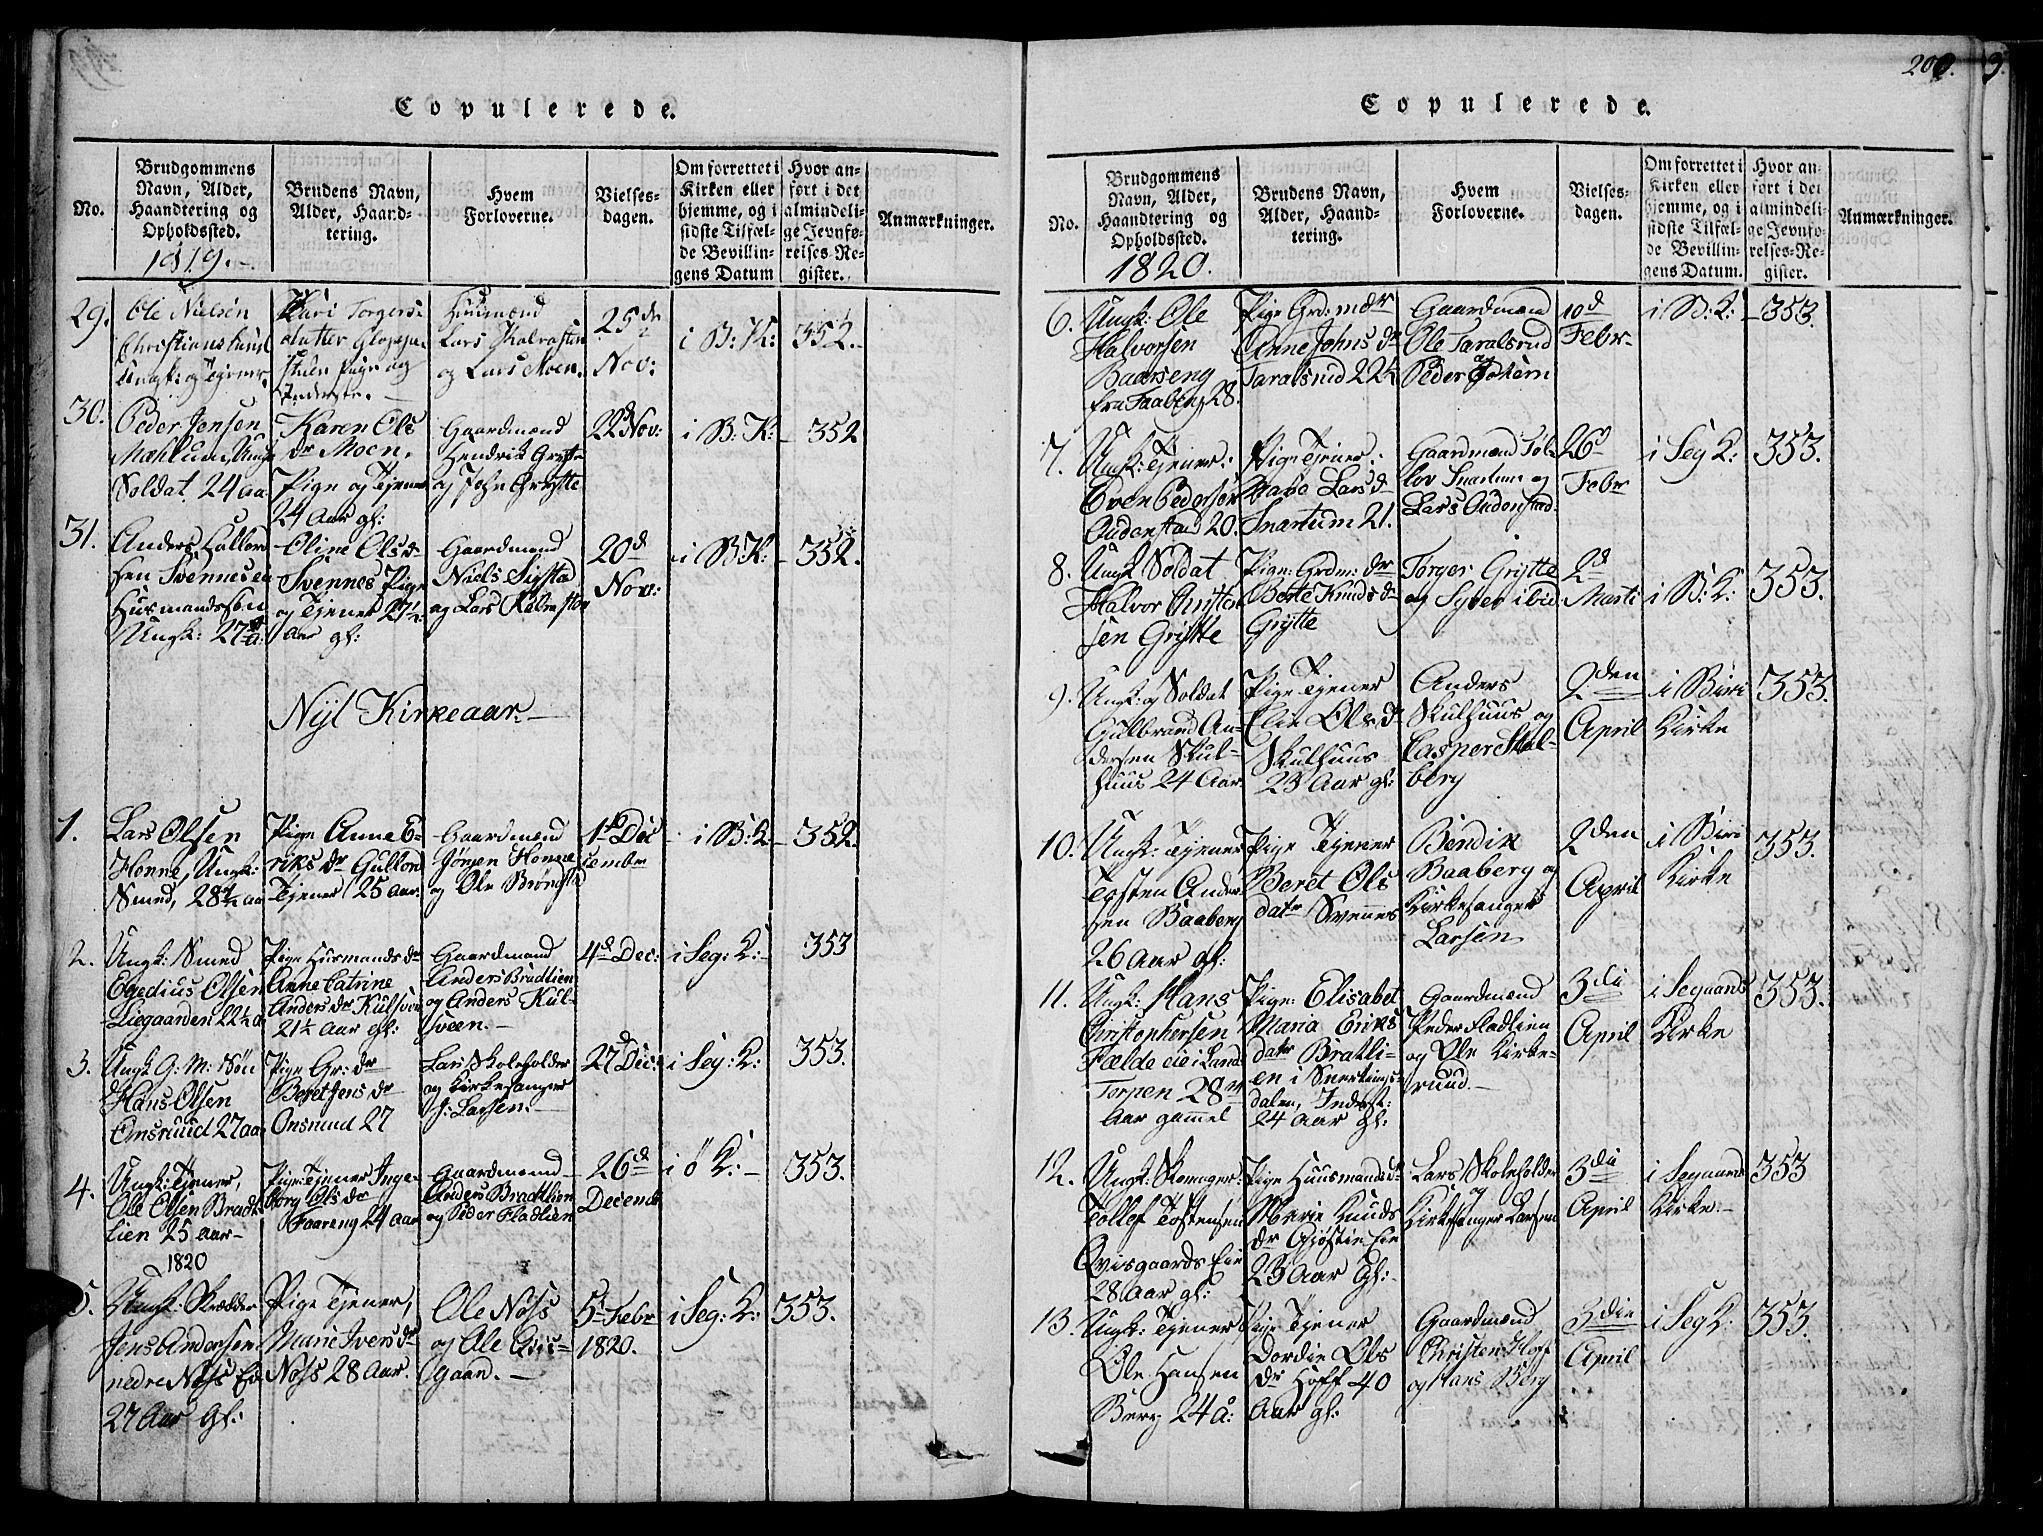 SAH, Biri prestekontor, Ministerialbok nr. 3, 1814-1828, s. 200